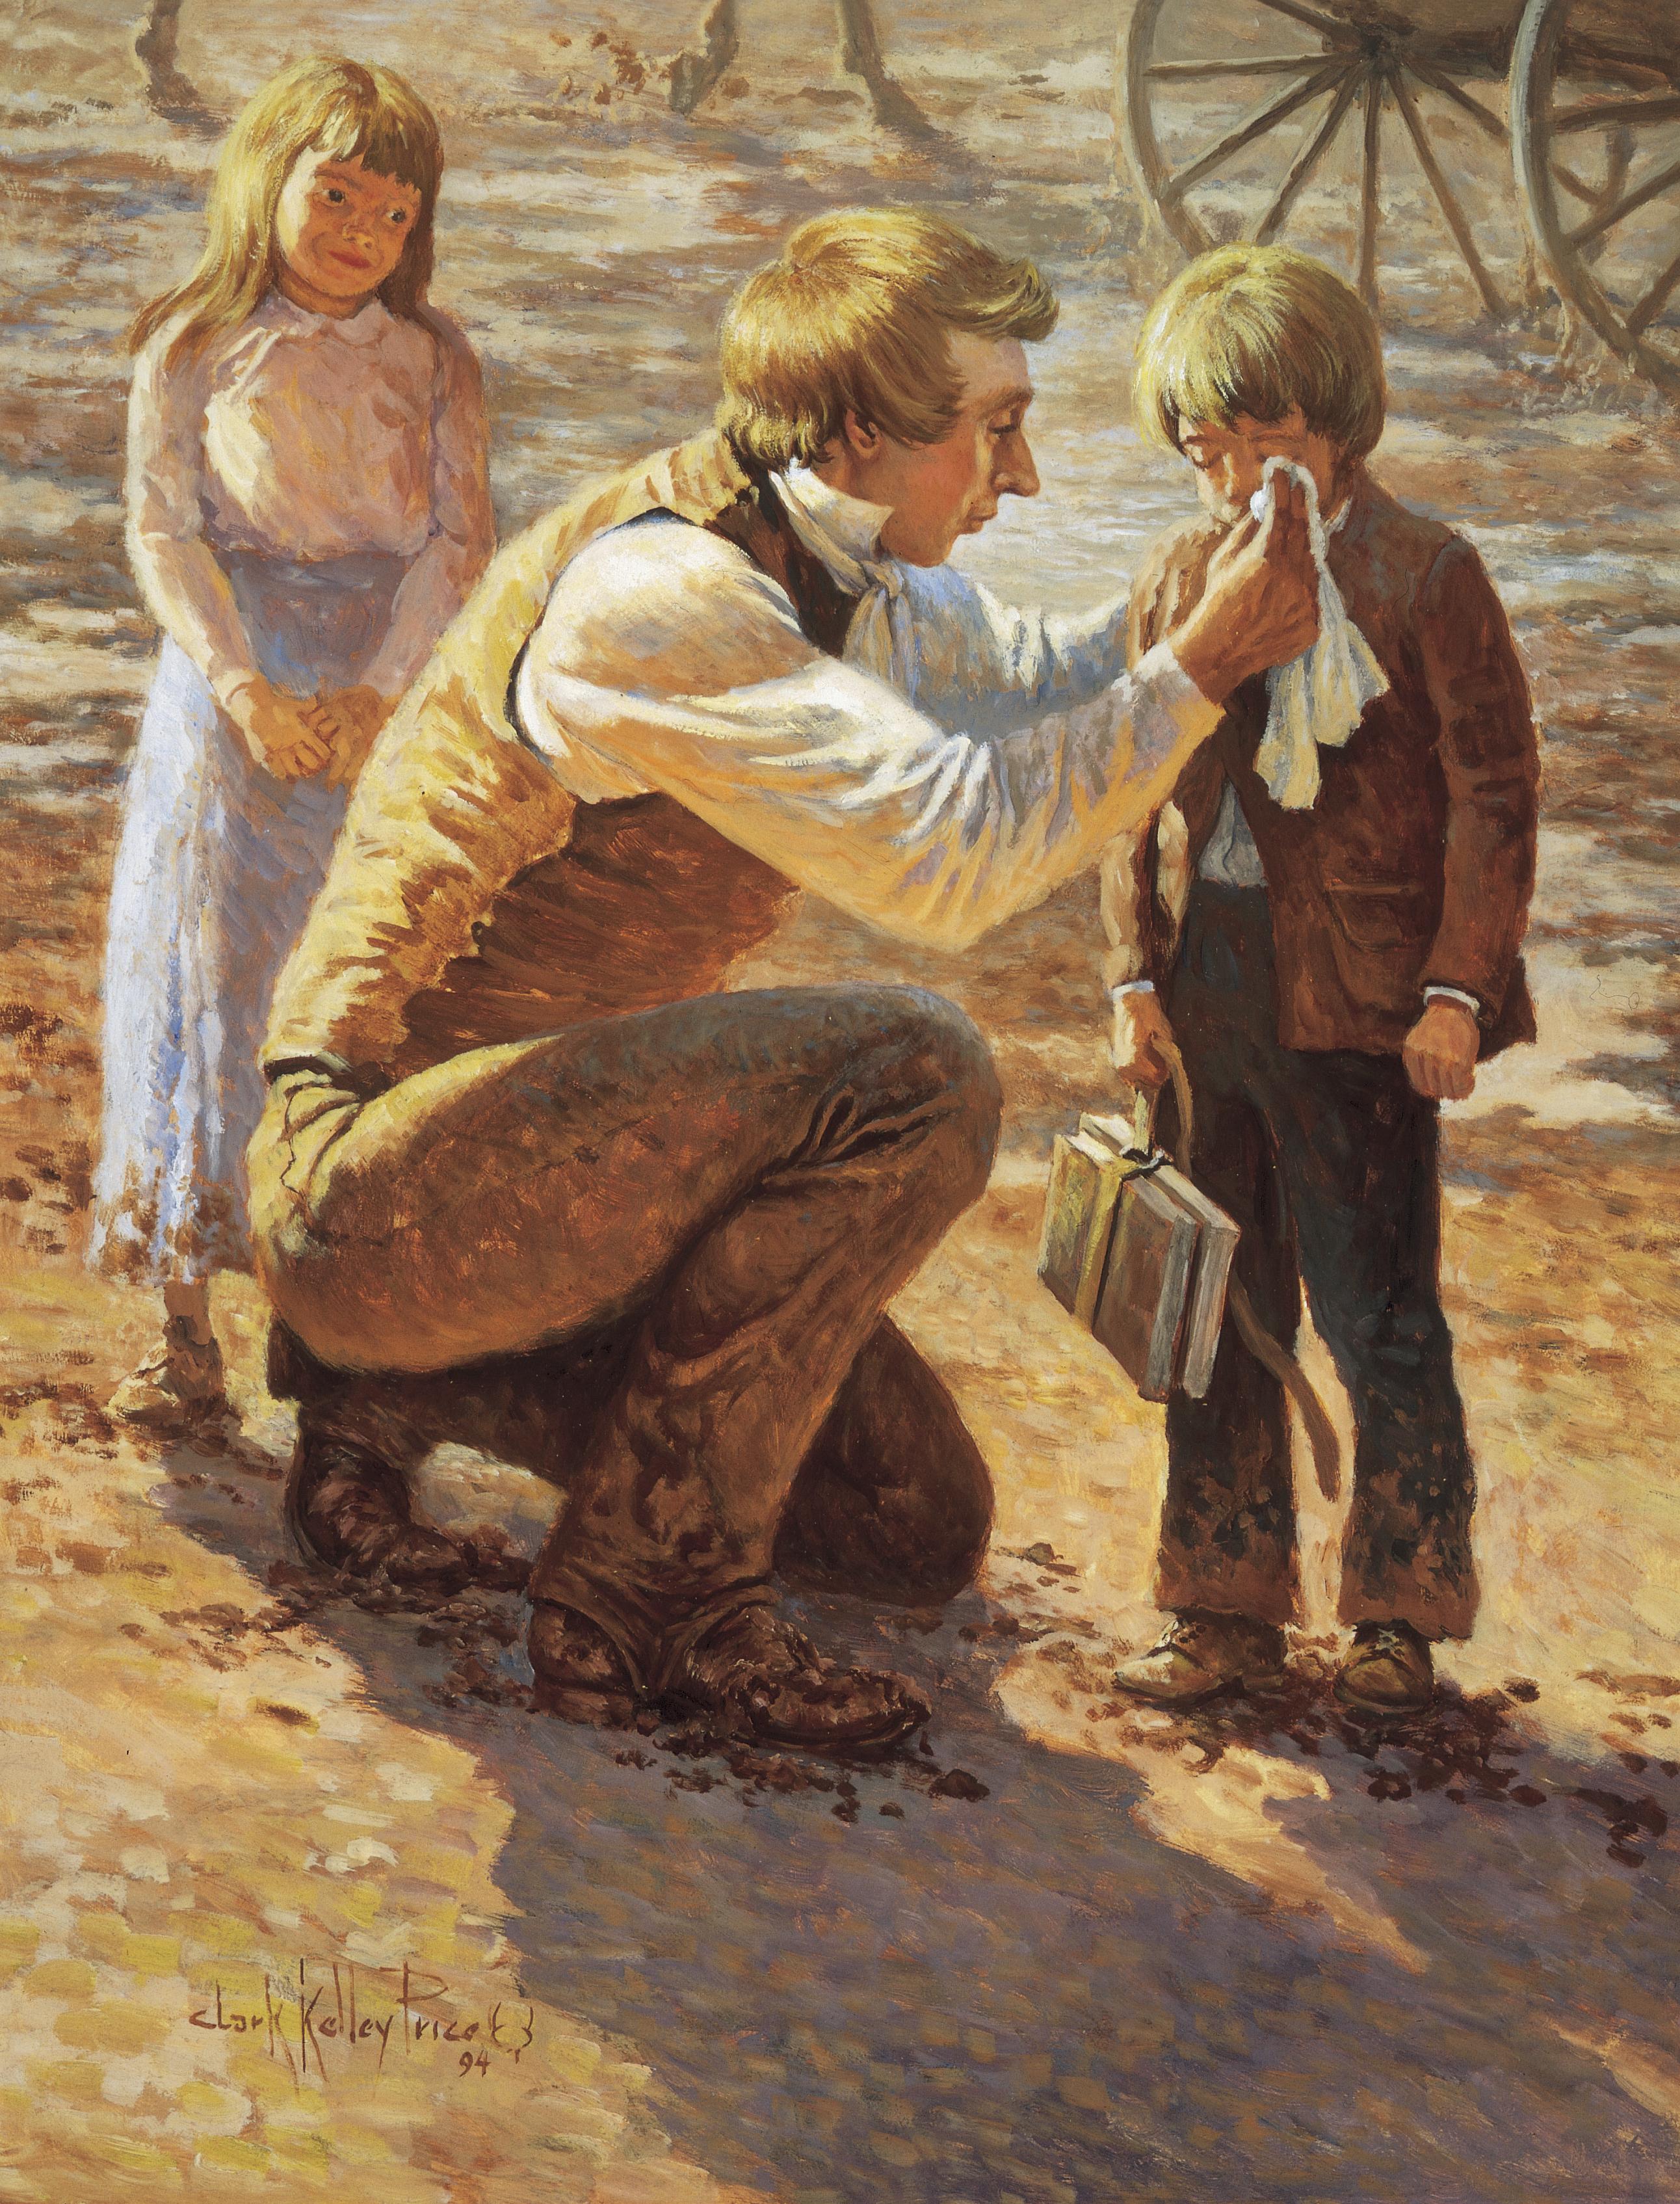 The Prophet Joseph Loved Children, by Clark Kelley Price; GAK 420; Primary manual 5-34; 3 Nephi 9:22; Moroni 8:17